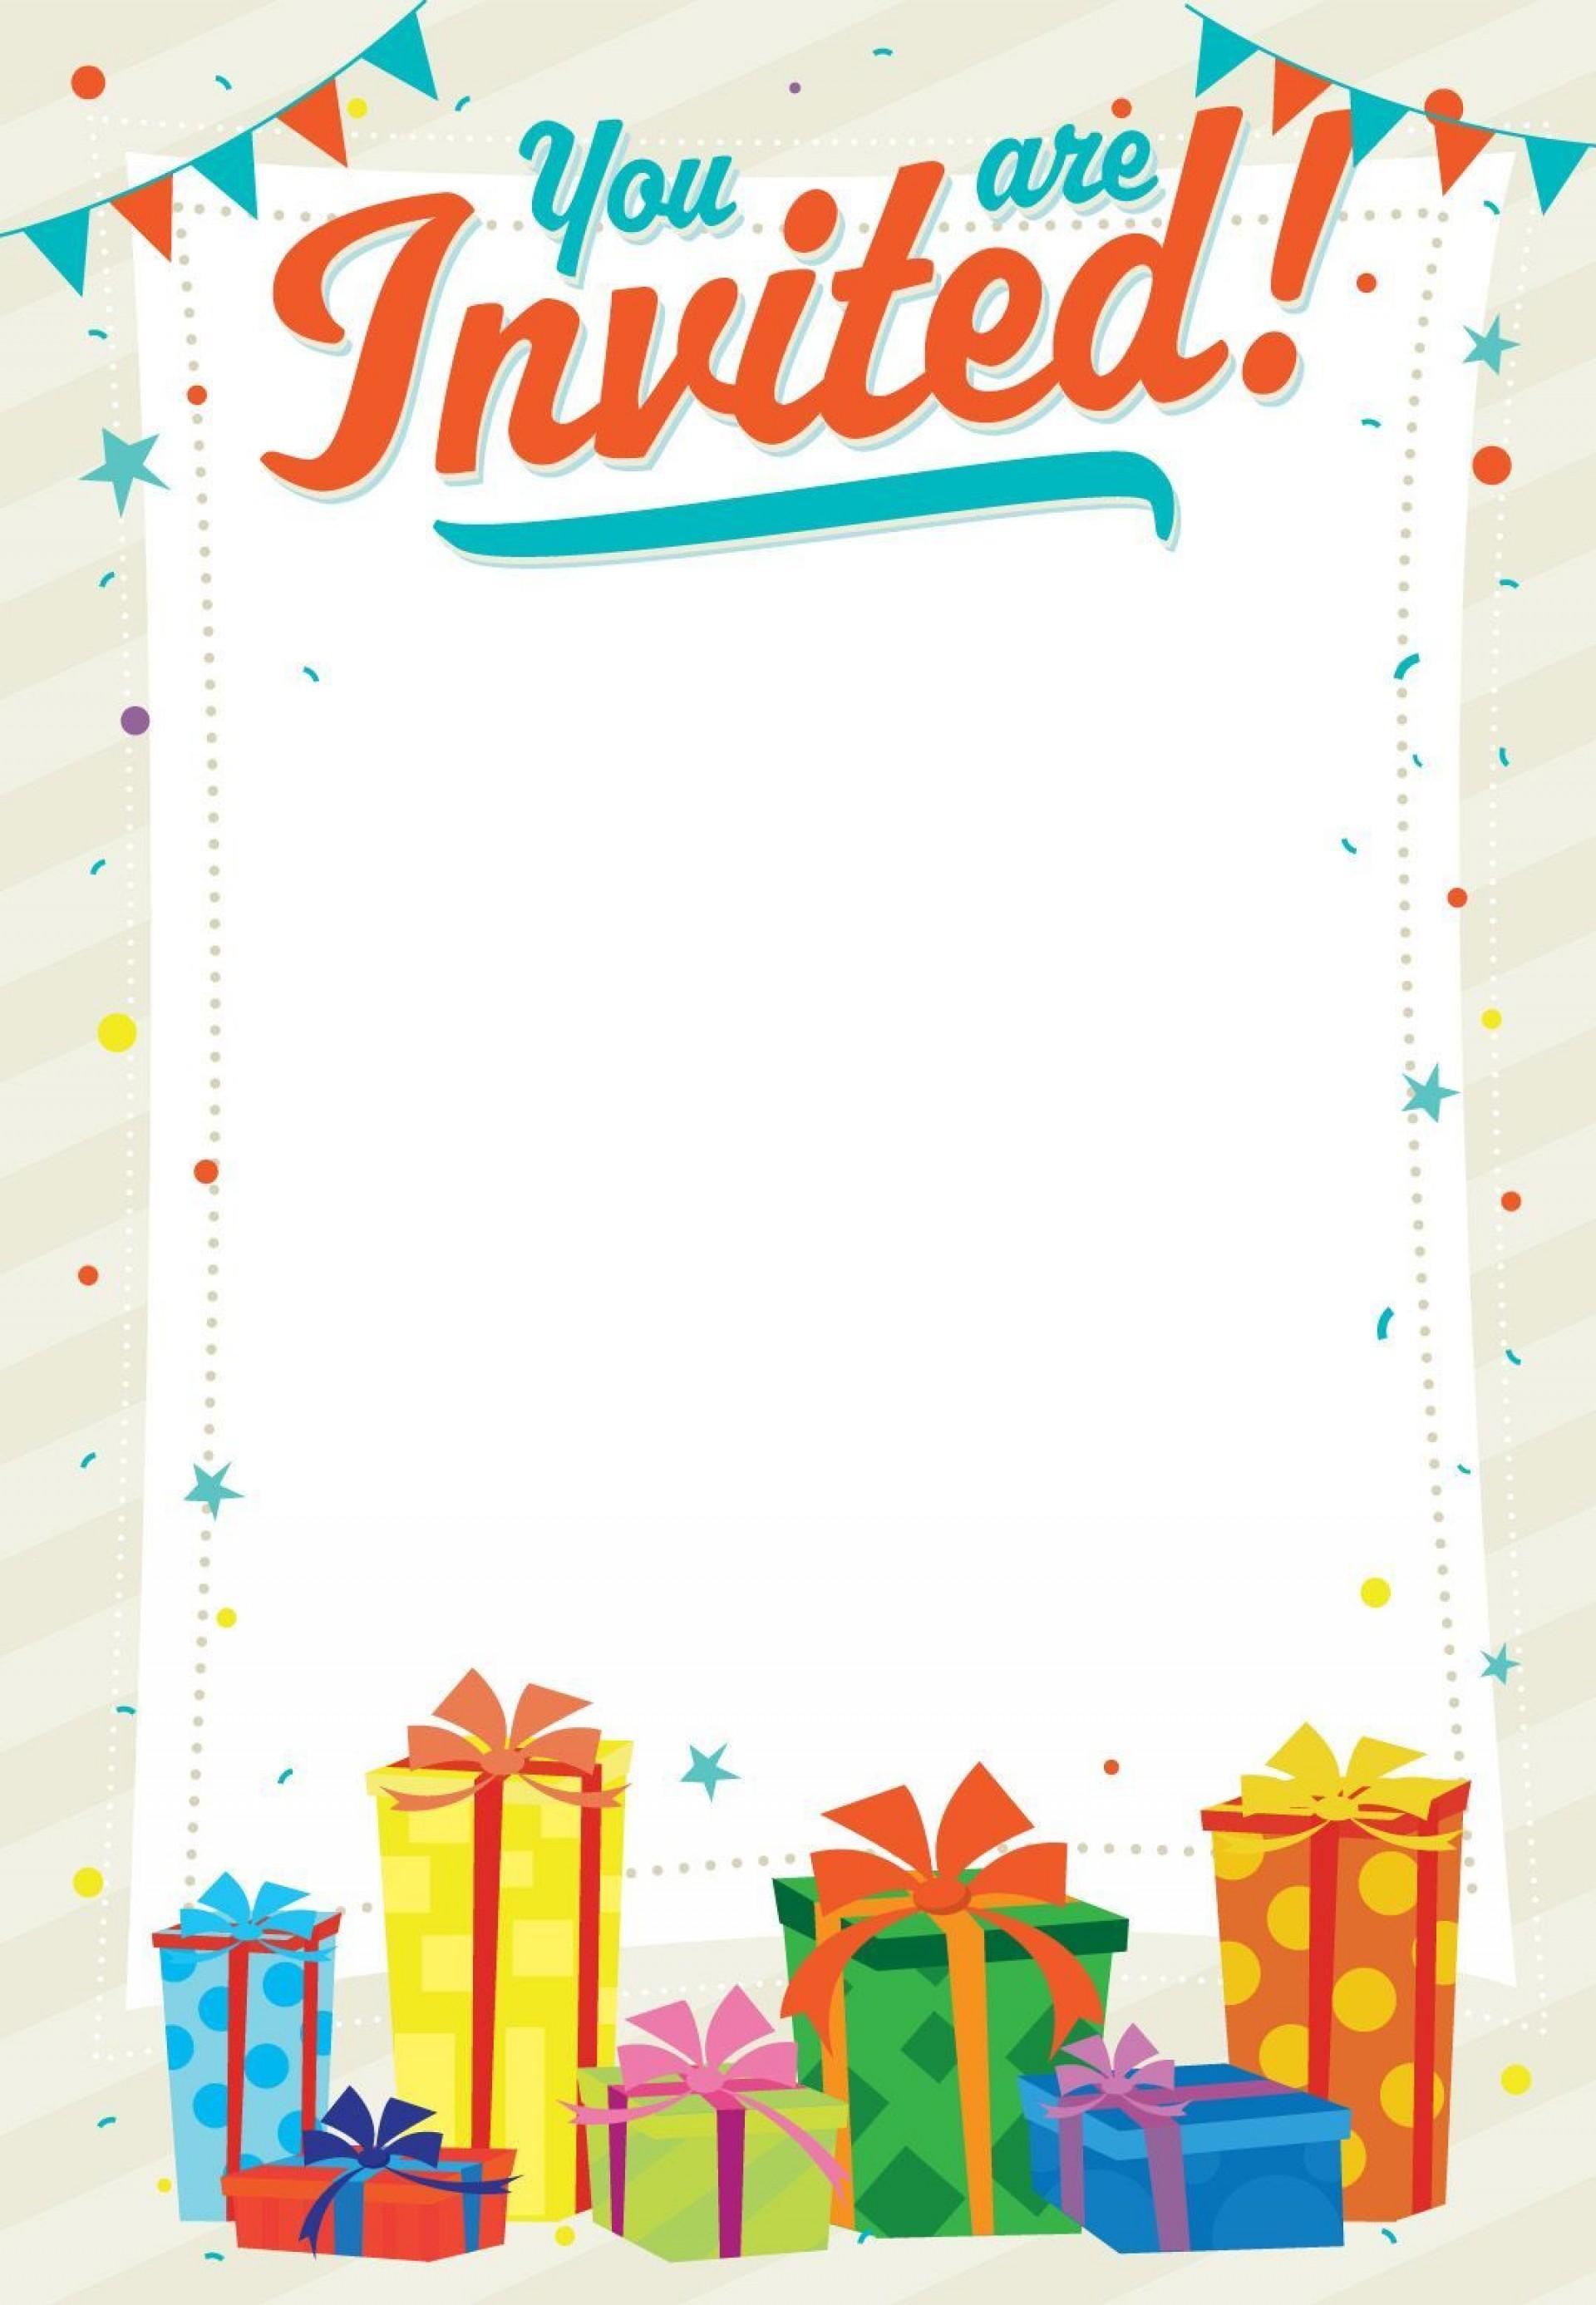 003 Imposing Free Online Printable Birthday Invitation Template Inspiration  Templates Card Maker1920